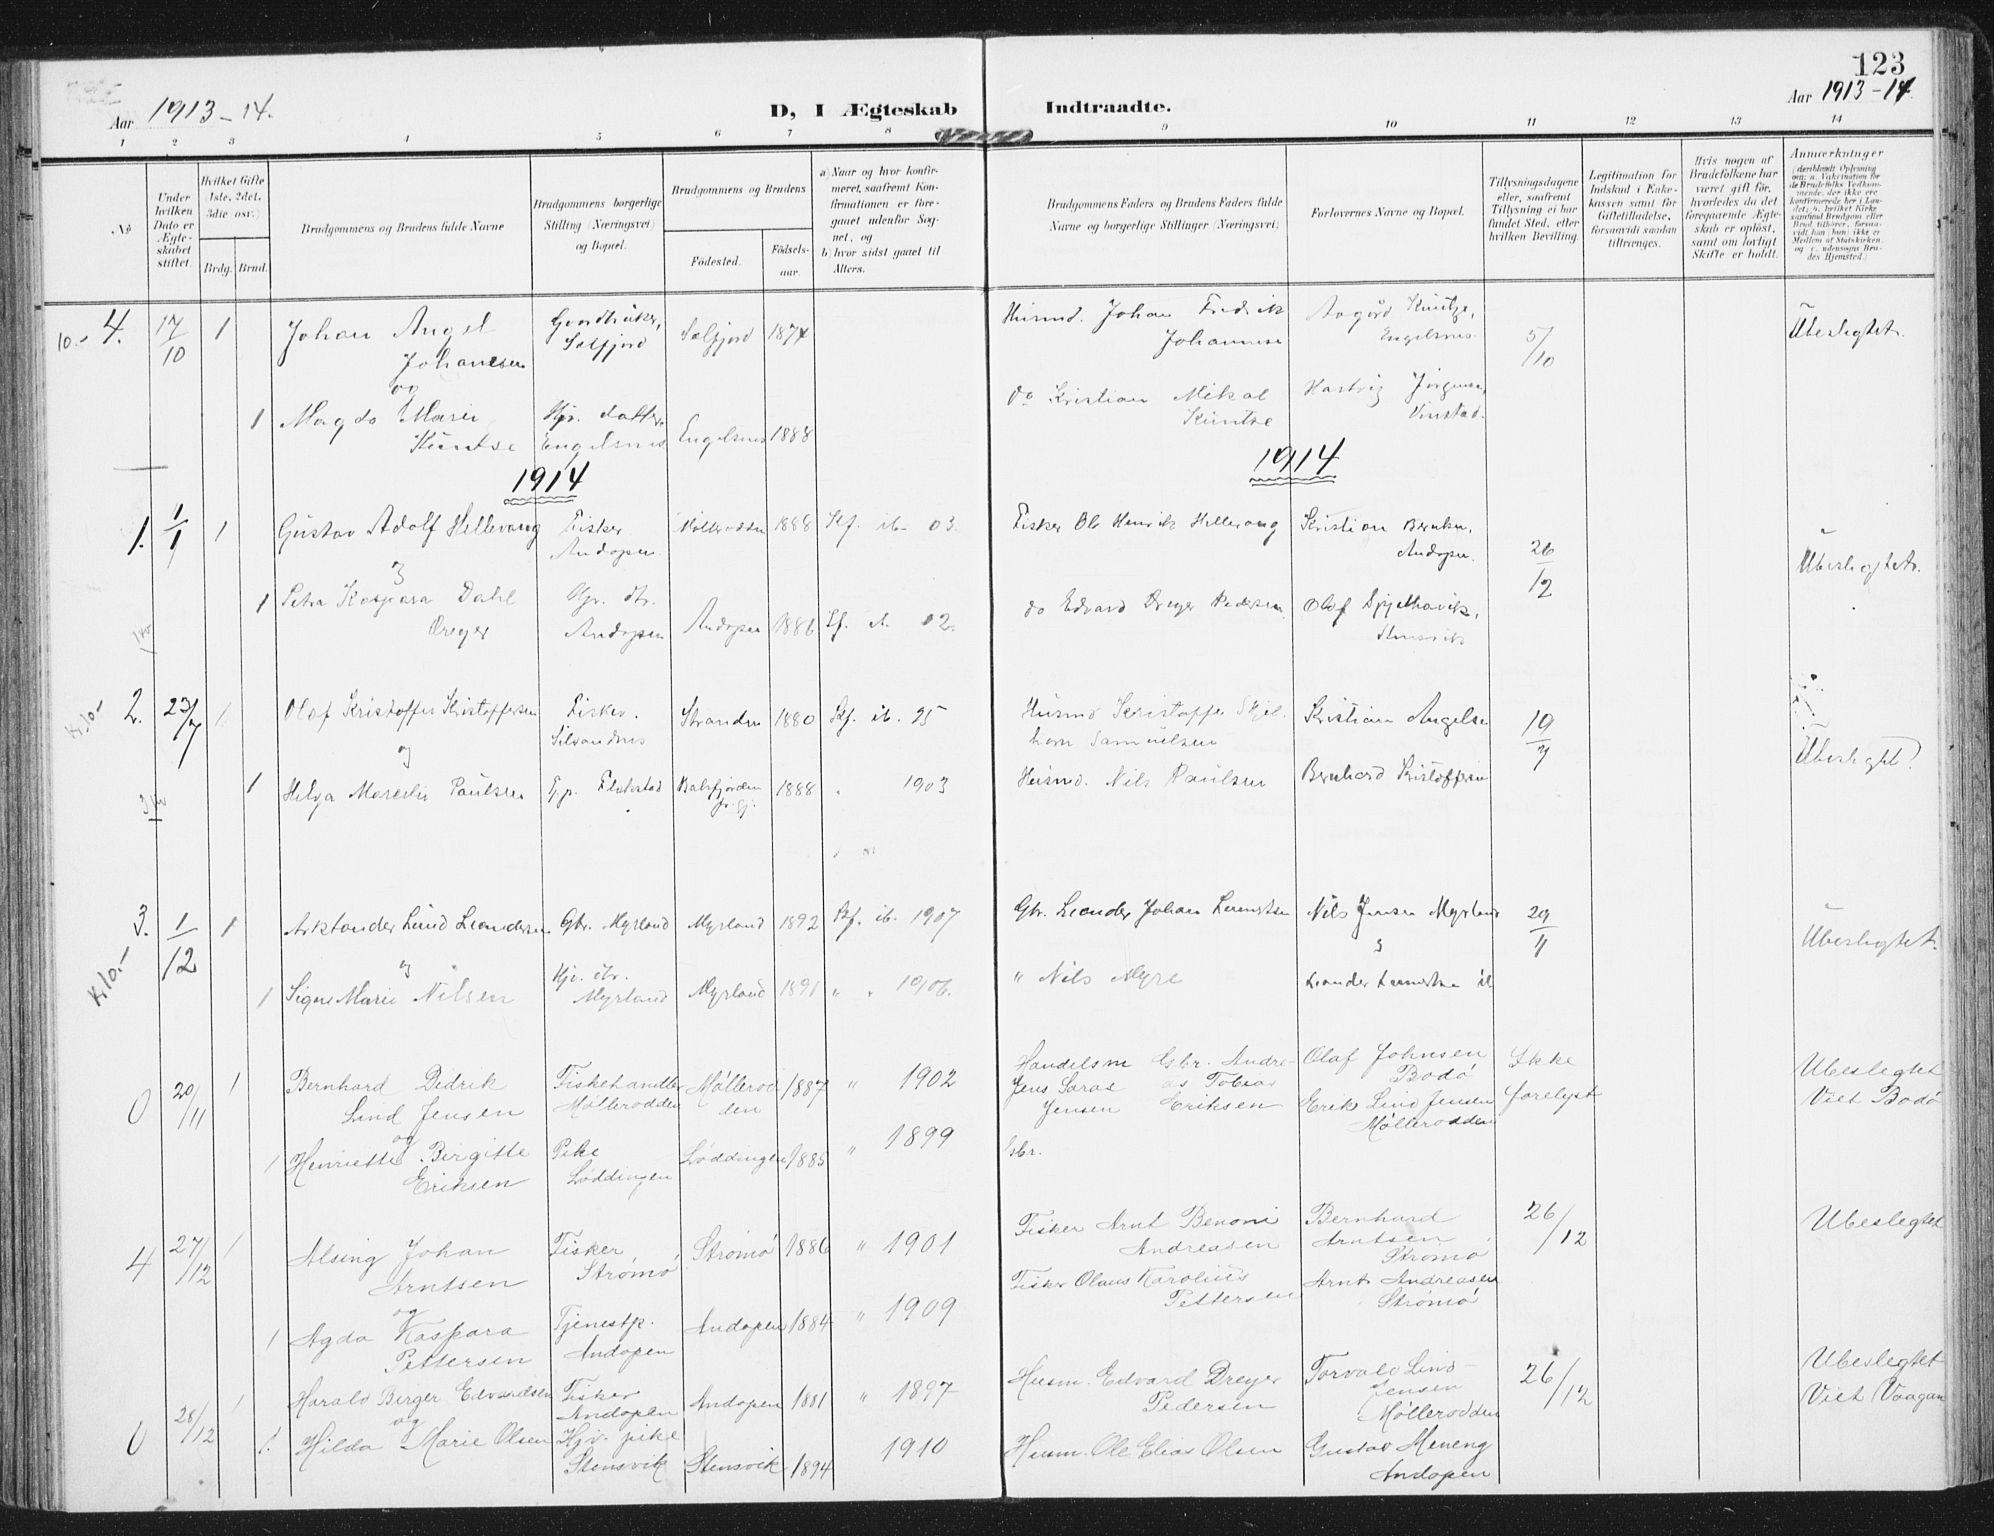 SAT, Ministerialprotokoller, klokkerbøker og fødselsregistre - Nordland, 885/L1206: Ministerialbok nr. 885A07, 1905-1915, s. 123